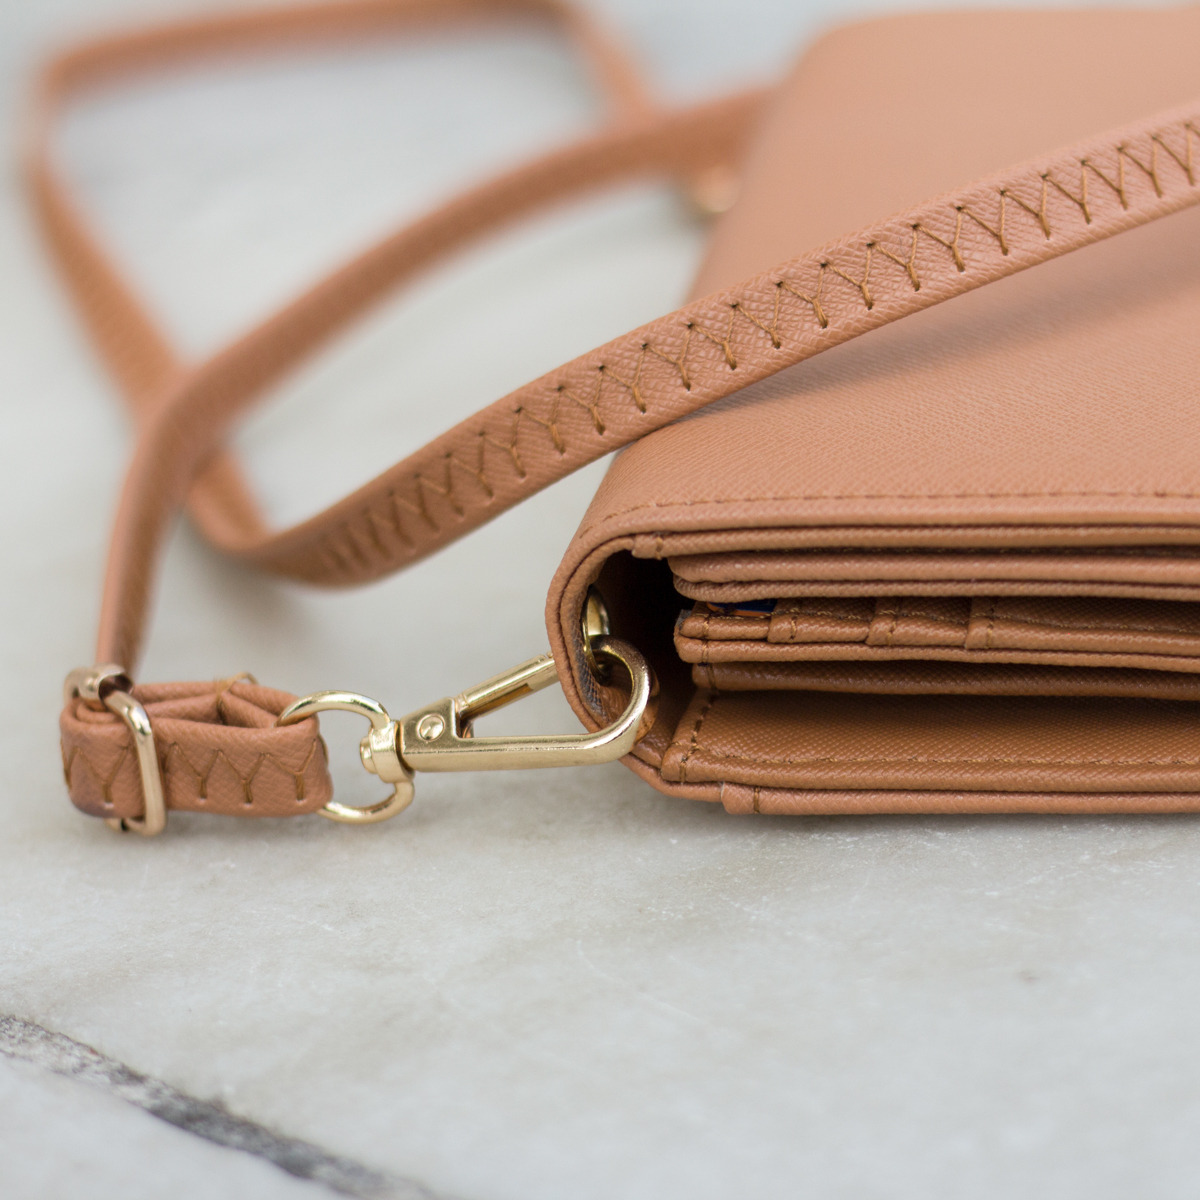 Primitive Beginnings womens summer apparel dresses travel off-shoulder purse wallet